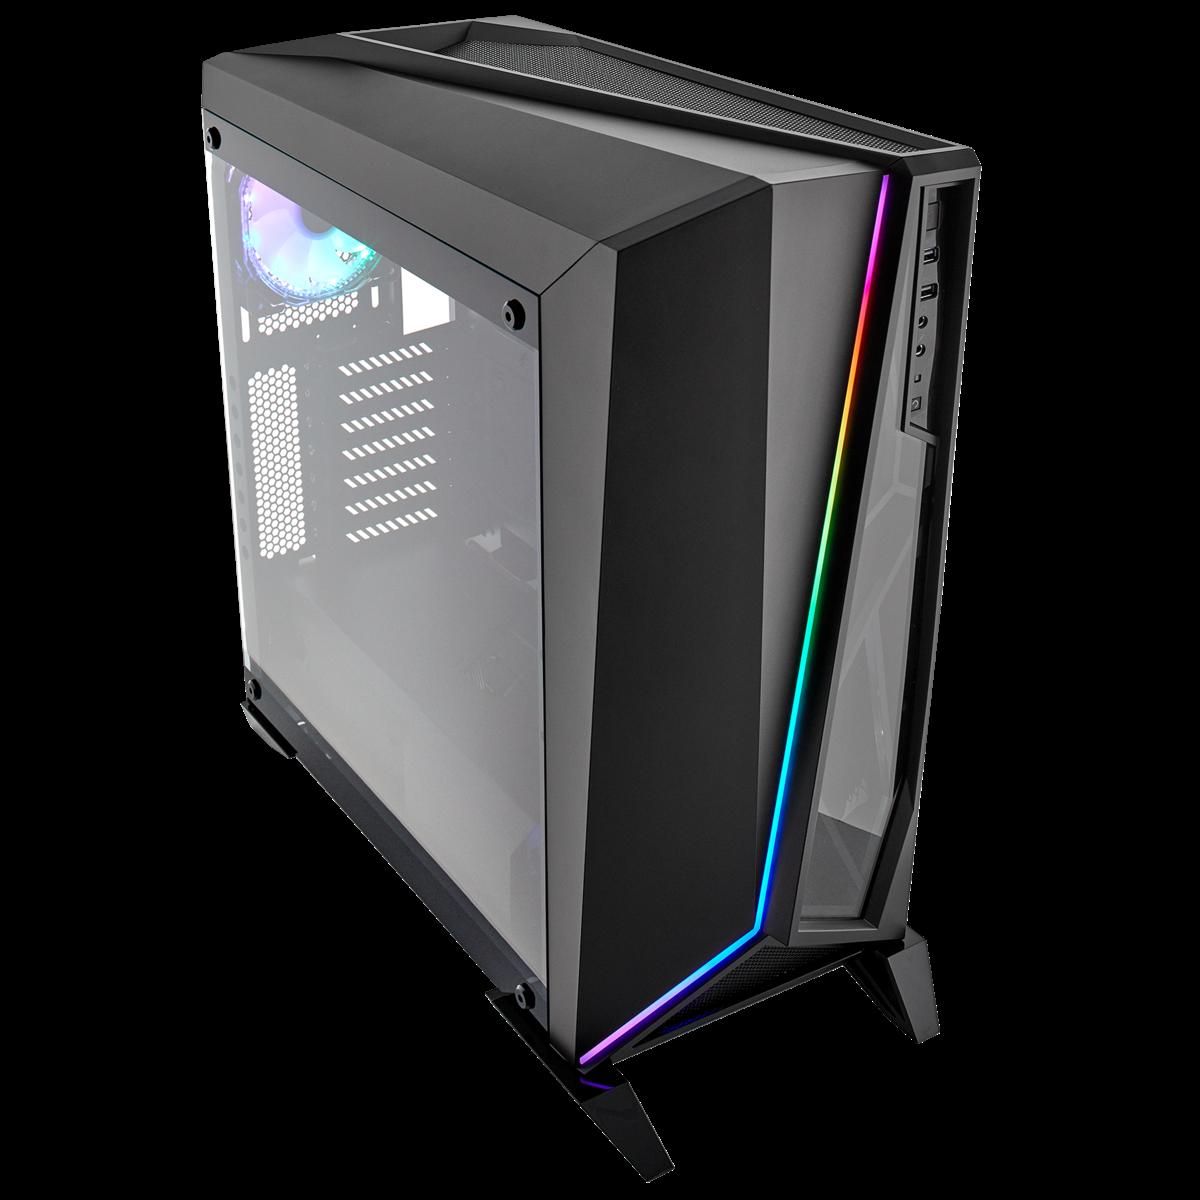 SPEC OMEGA BLACK RGB - CORSAIR